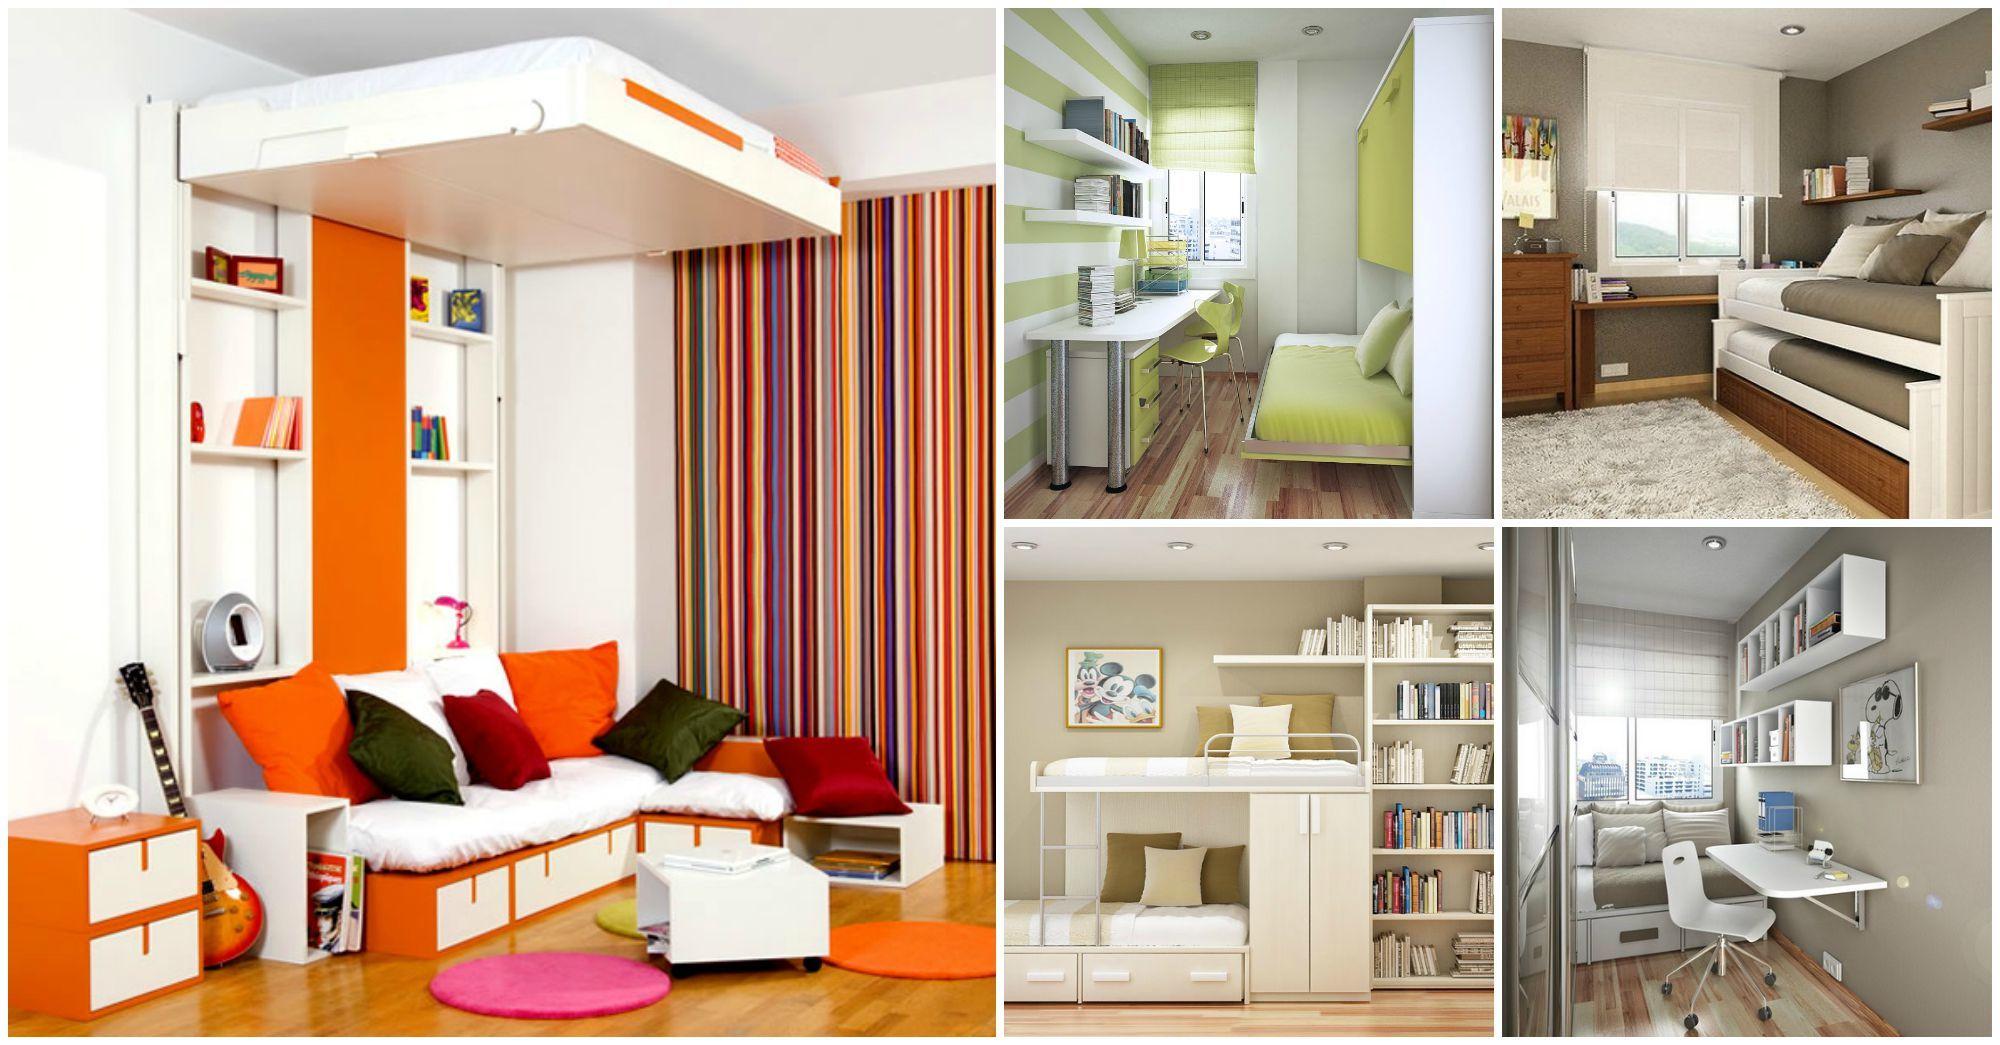 Impressive Bedroom Furniture Ideas for Tiny Bedrooms